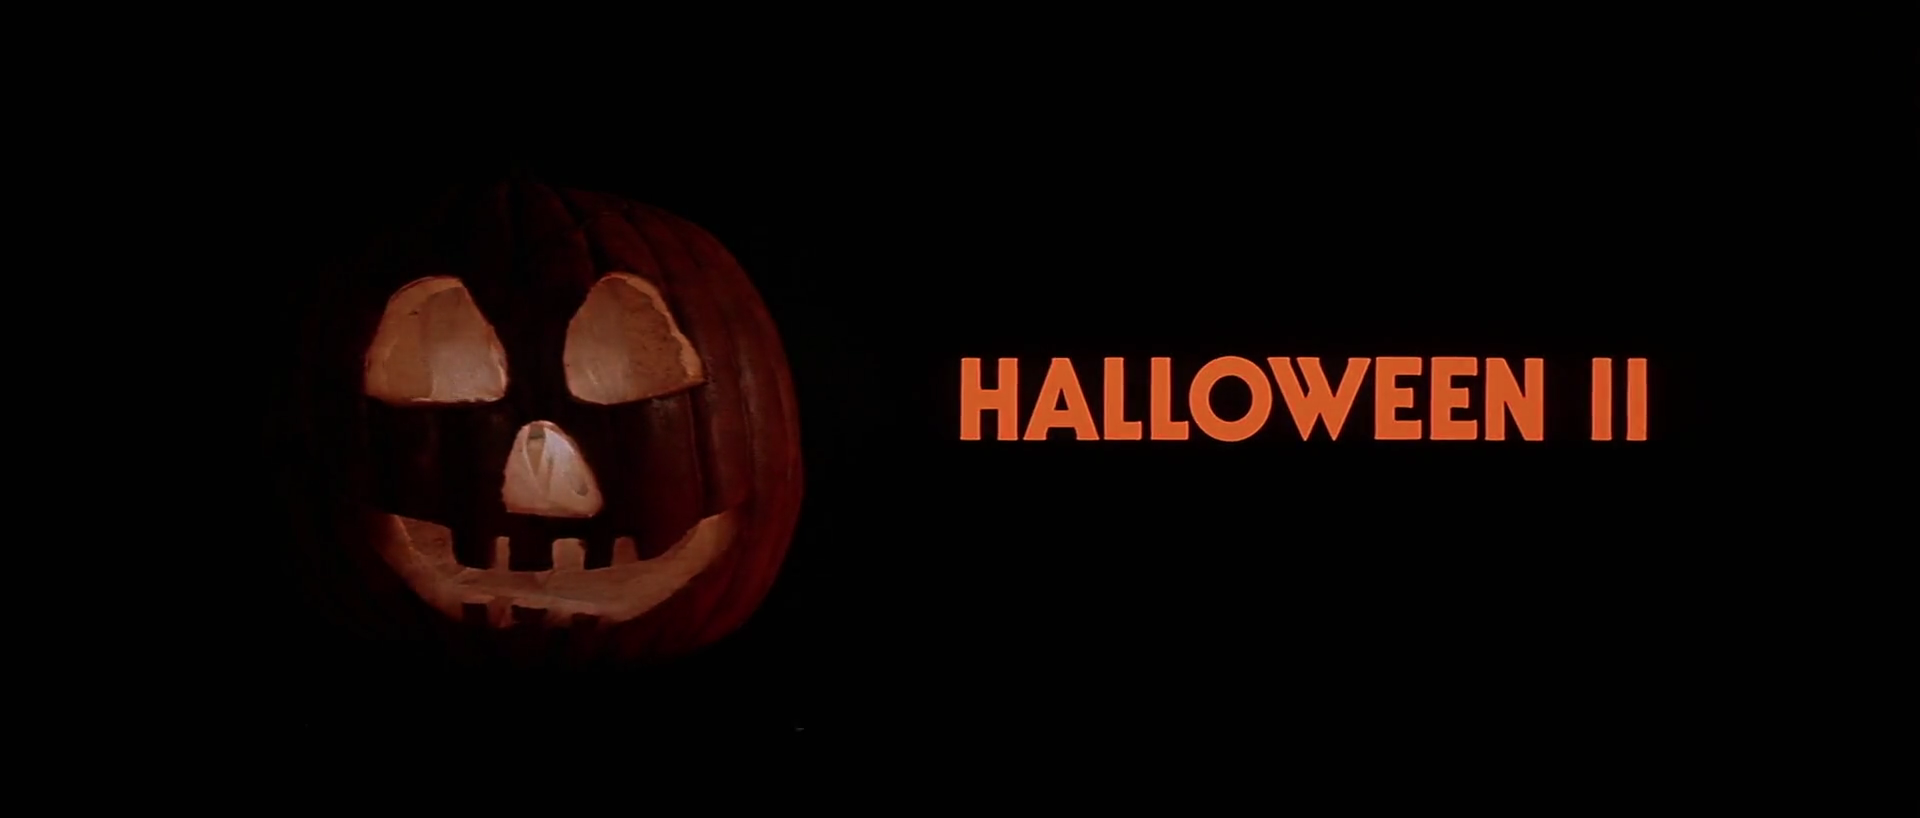 The Nights He Came Home – A Halloween Retrospective, Part II ...